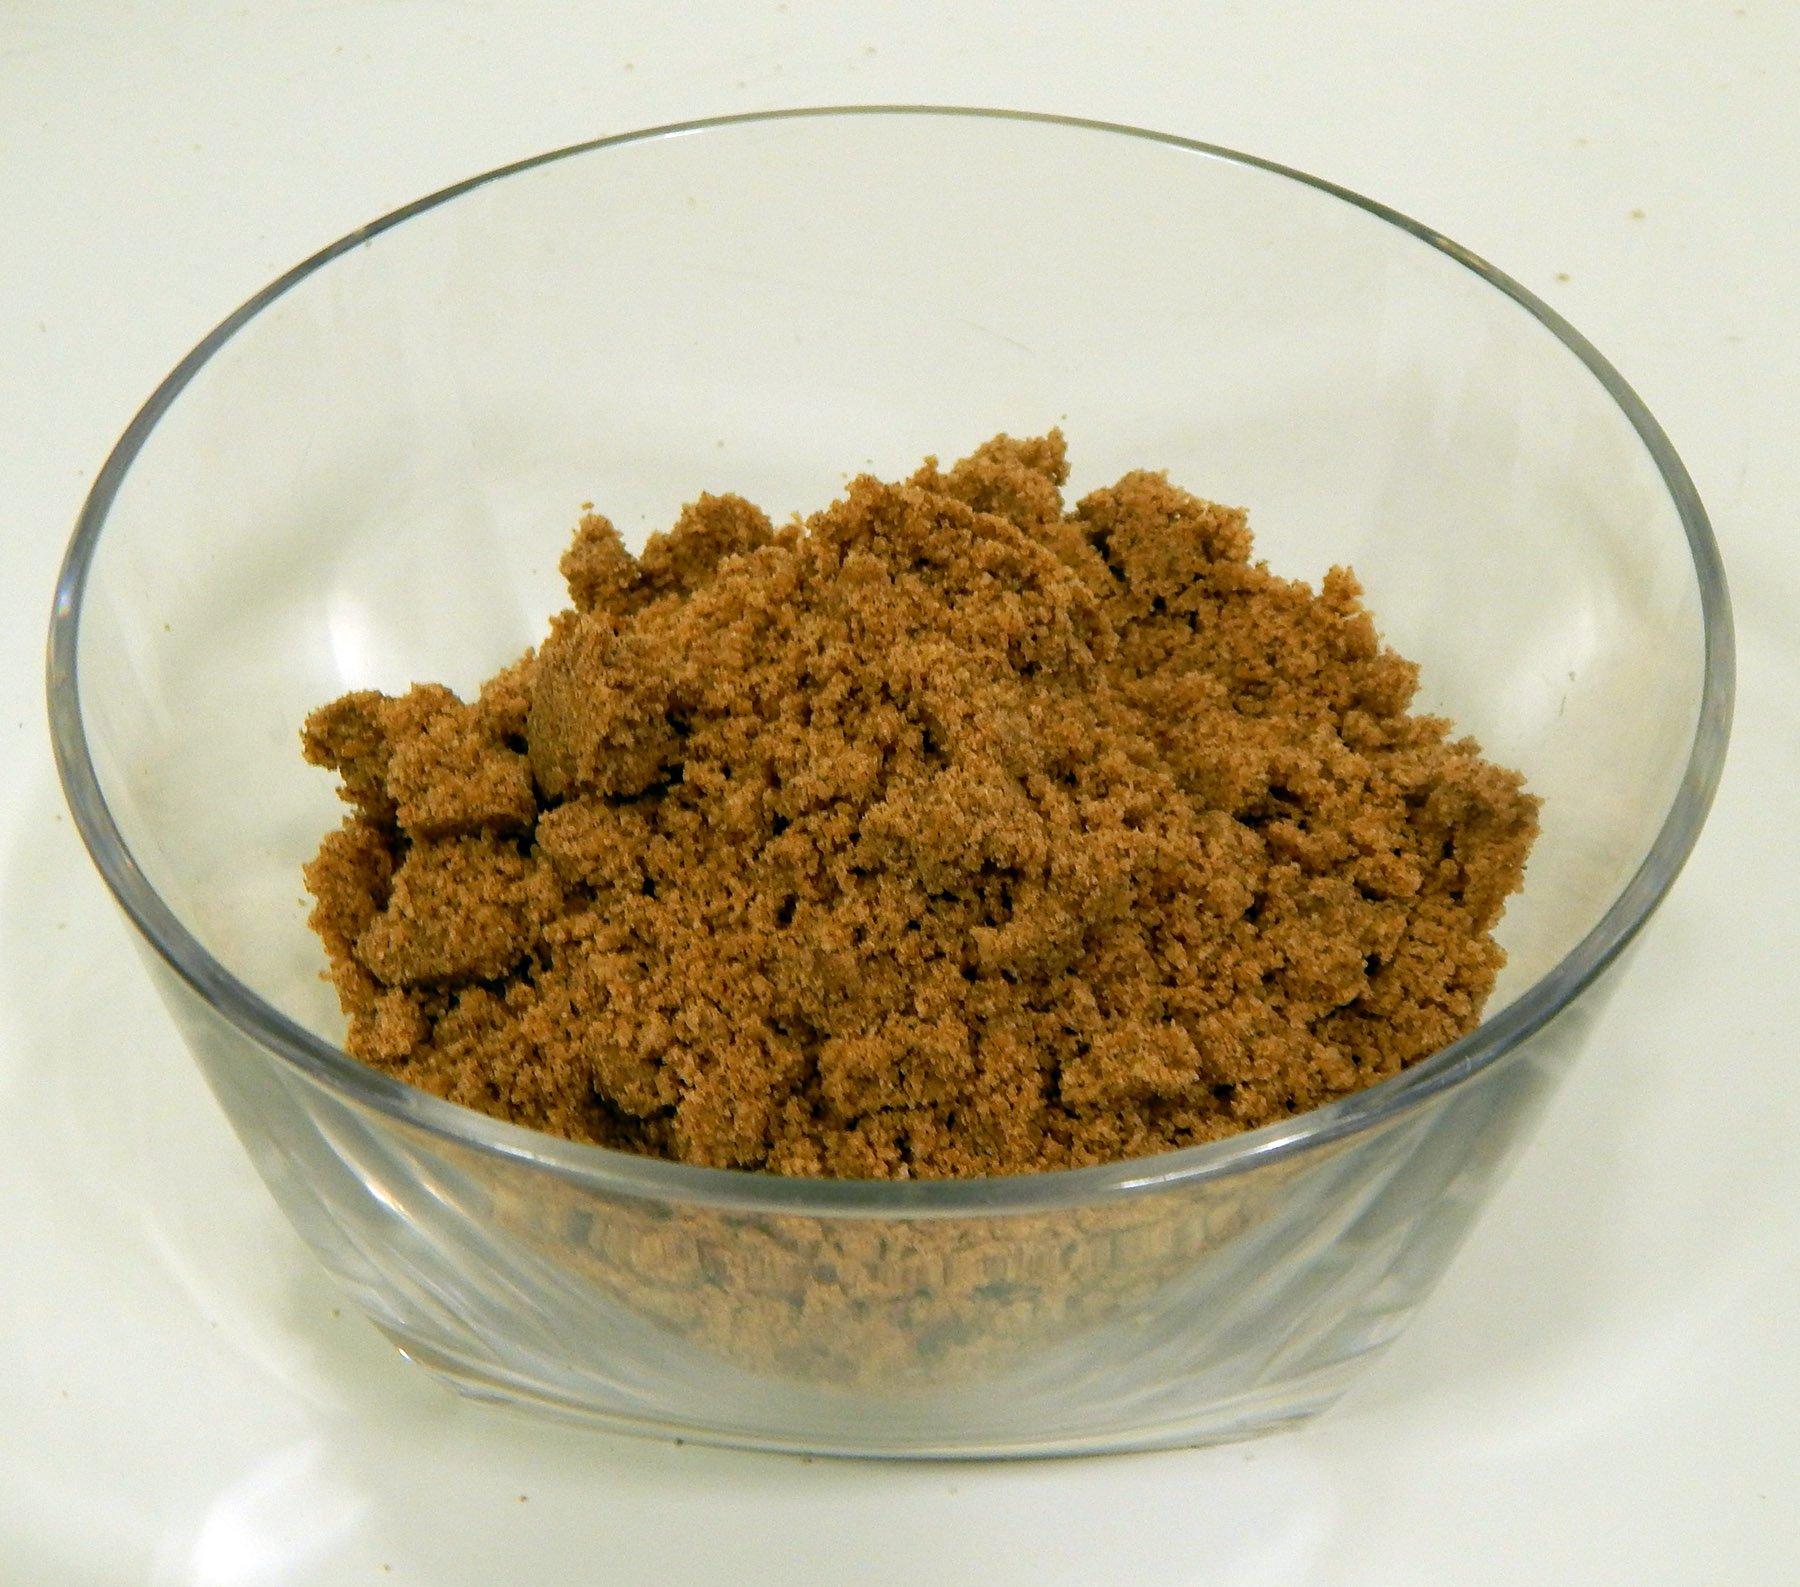 BNJKC Gourmet Cinnamon Streusel - Box Image